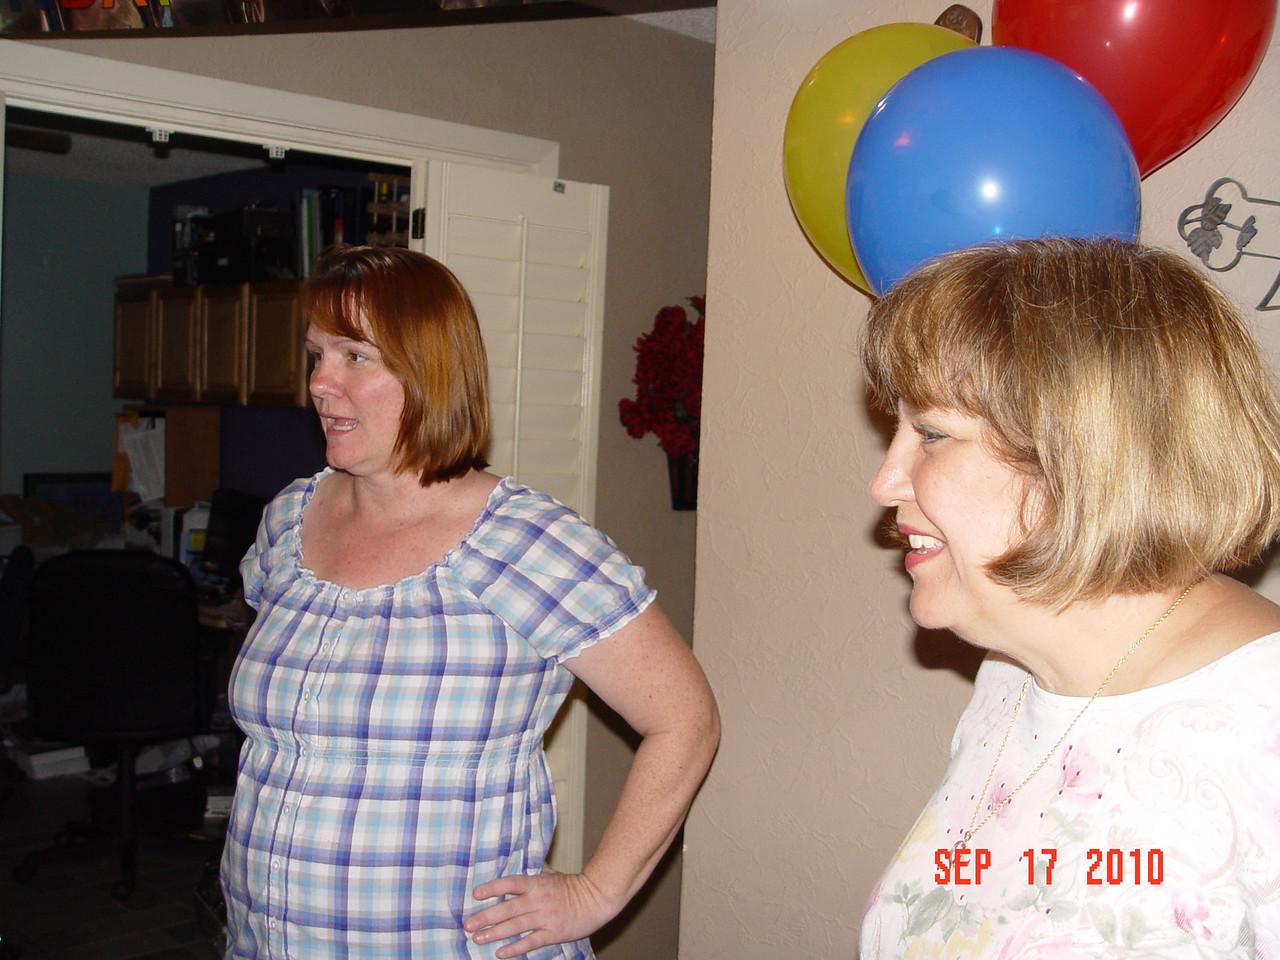 2010-09-17-devons-party-cisco-party 036Devon-mom-jan